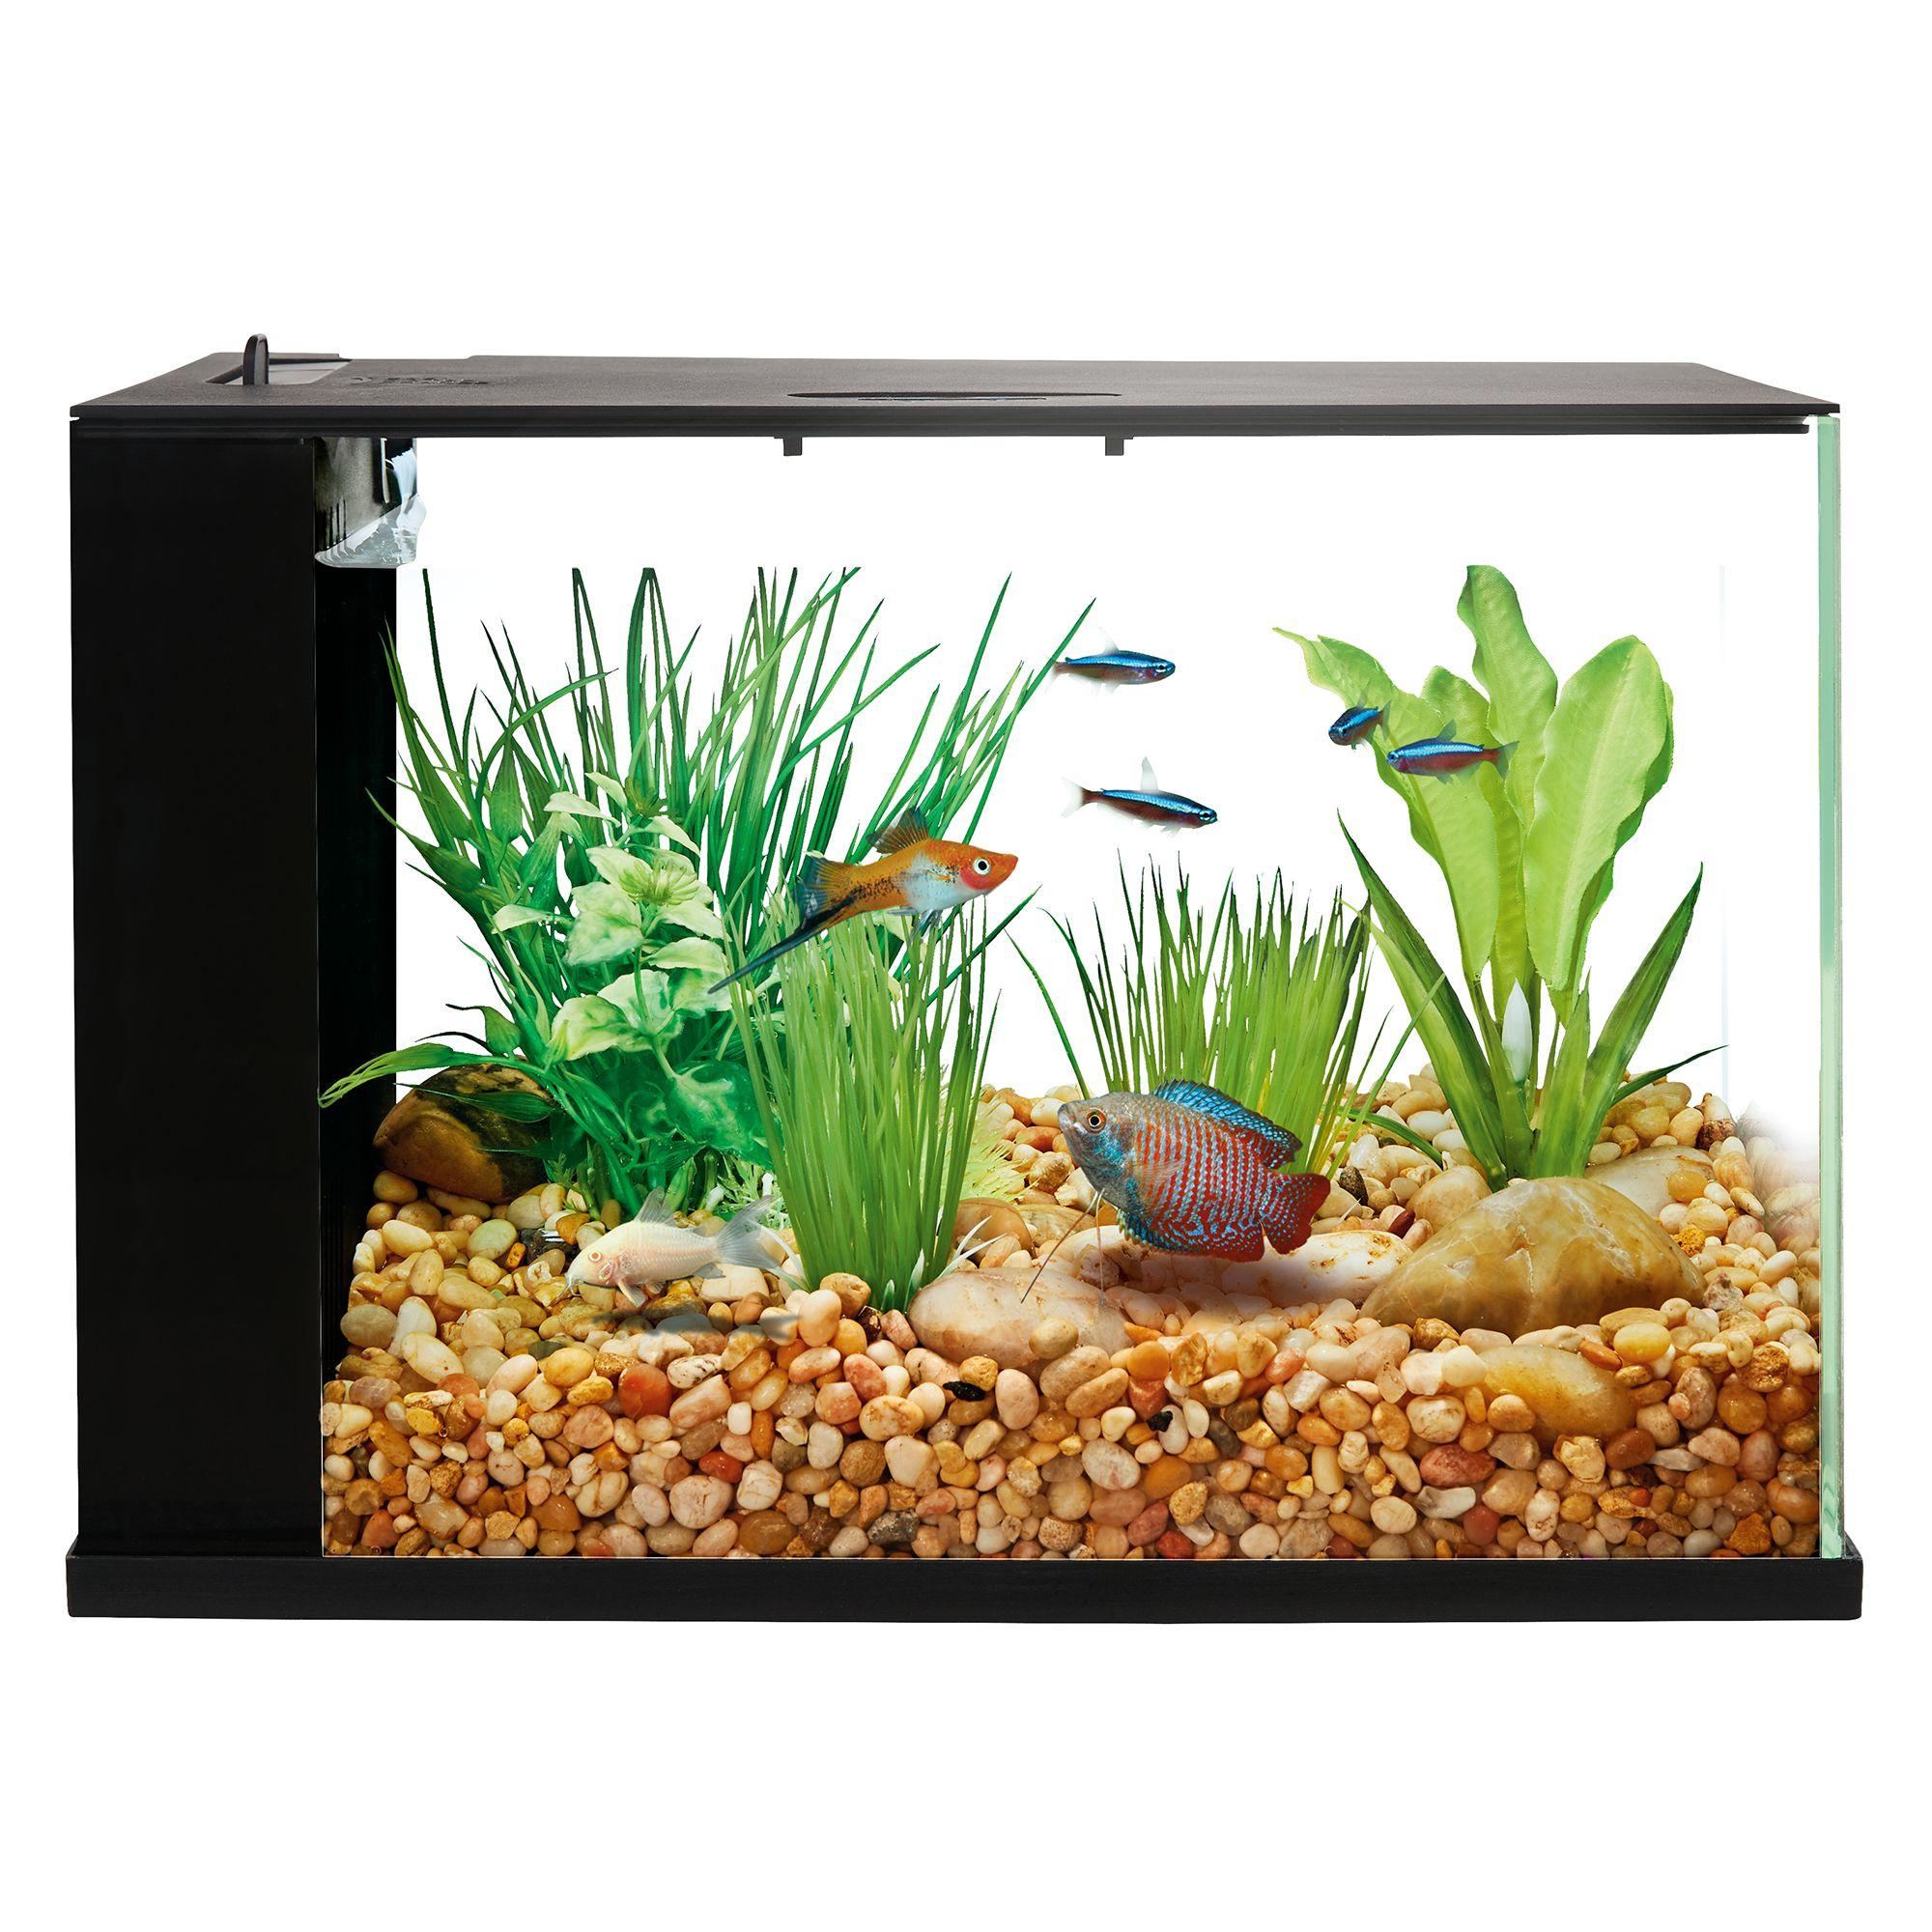 Top Fin Indulge Trade 3 Gallon Aquarium Fish Aquariums Petsmart